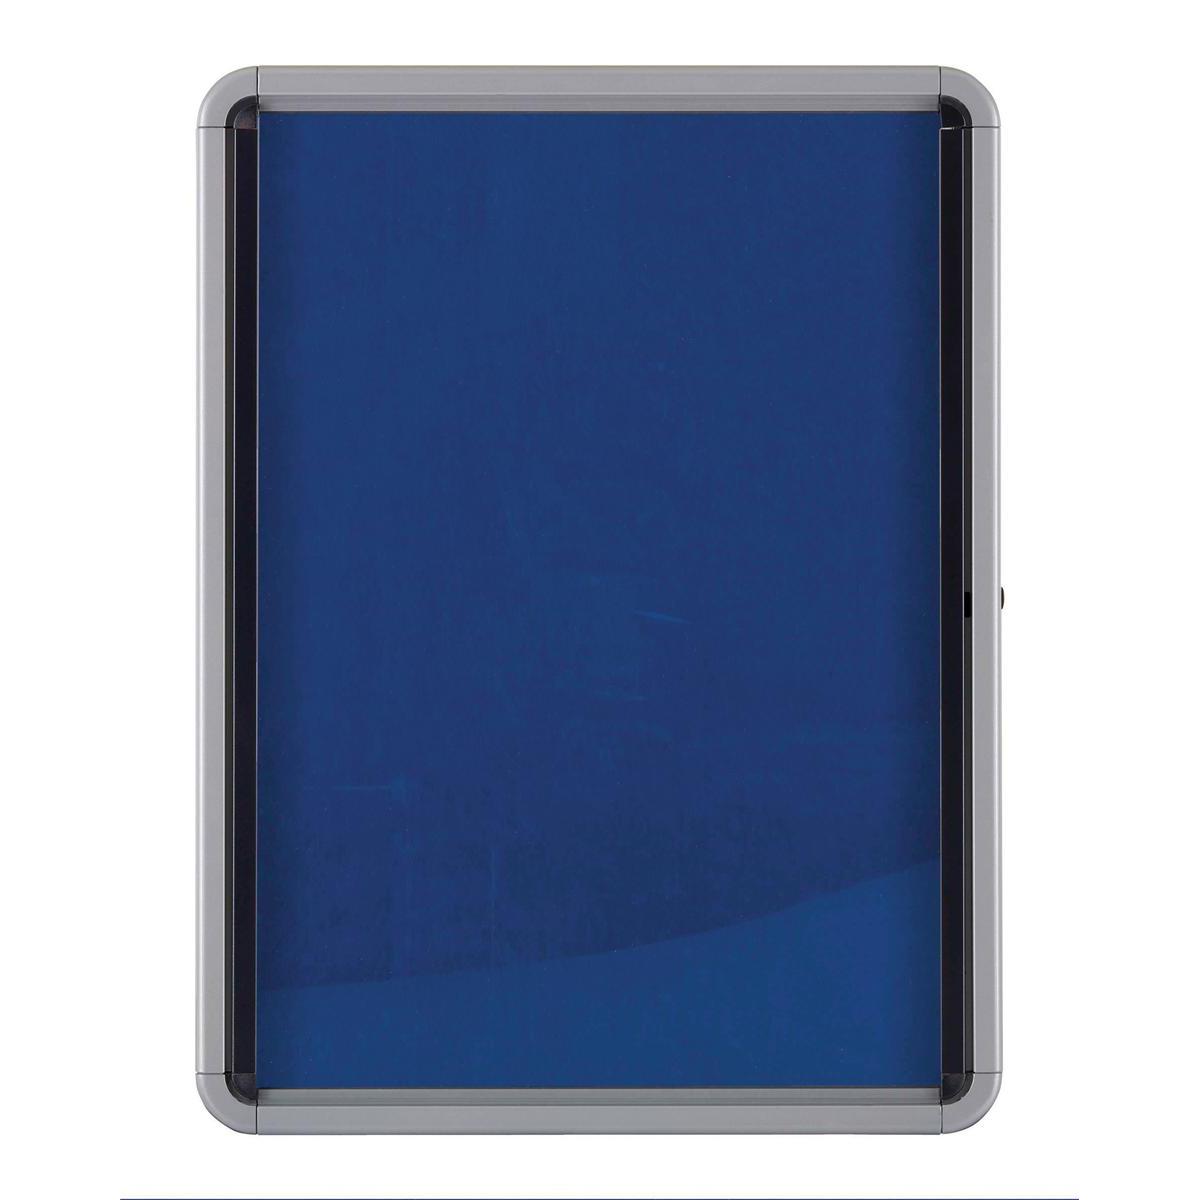 Nobo Noticeboard for Interior Glazed Case Lockable Fabric 9xA4 W792xD77xH1040mm Ref 1902556